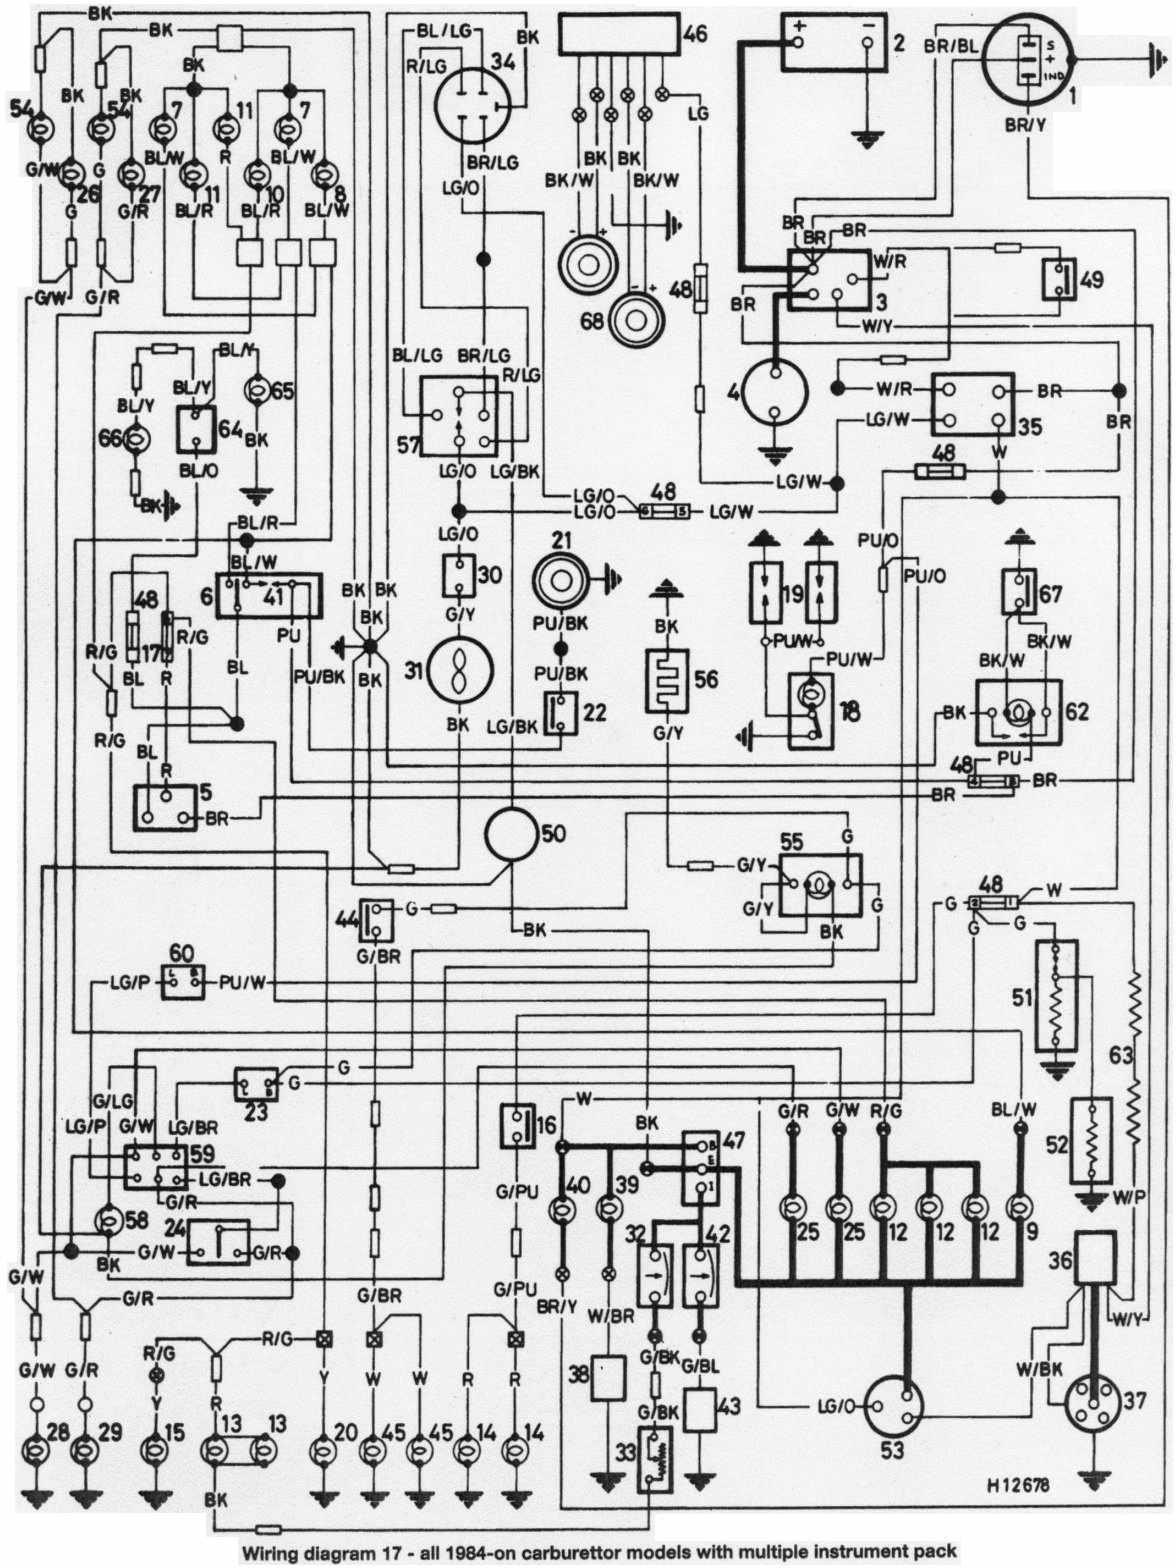 Alert Automotive Wiring Diagrams Detailed Schematics Diagram Ford M35a3 U2022 Harness